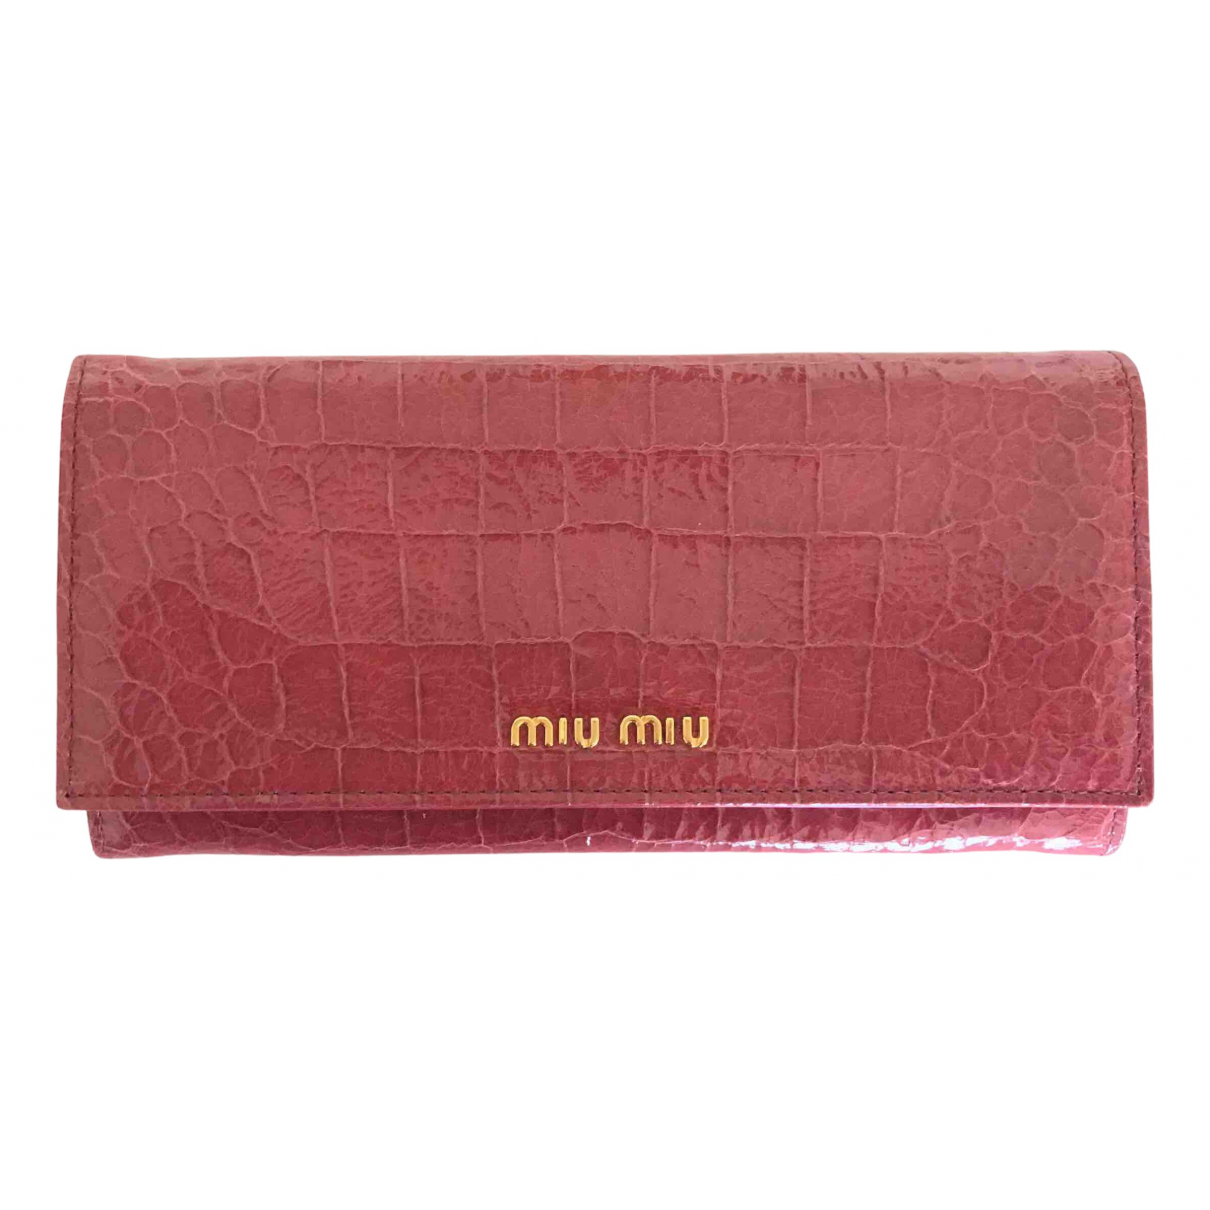 Miu Miu - Portefeuille   pour femme en cuir verni - rose